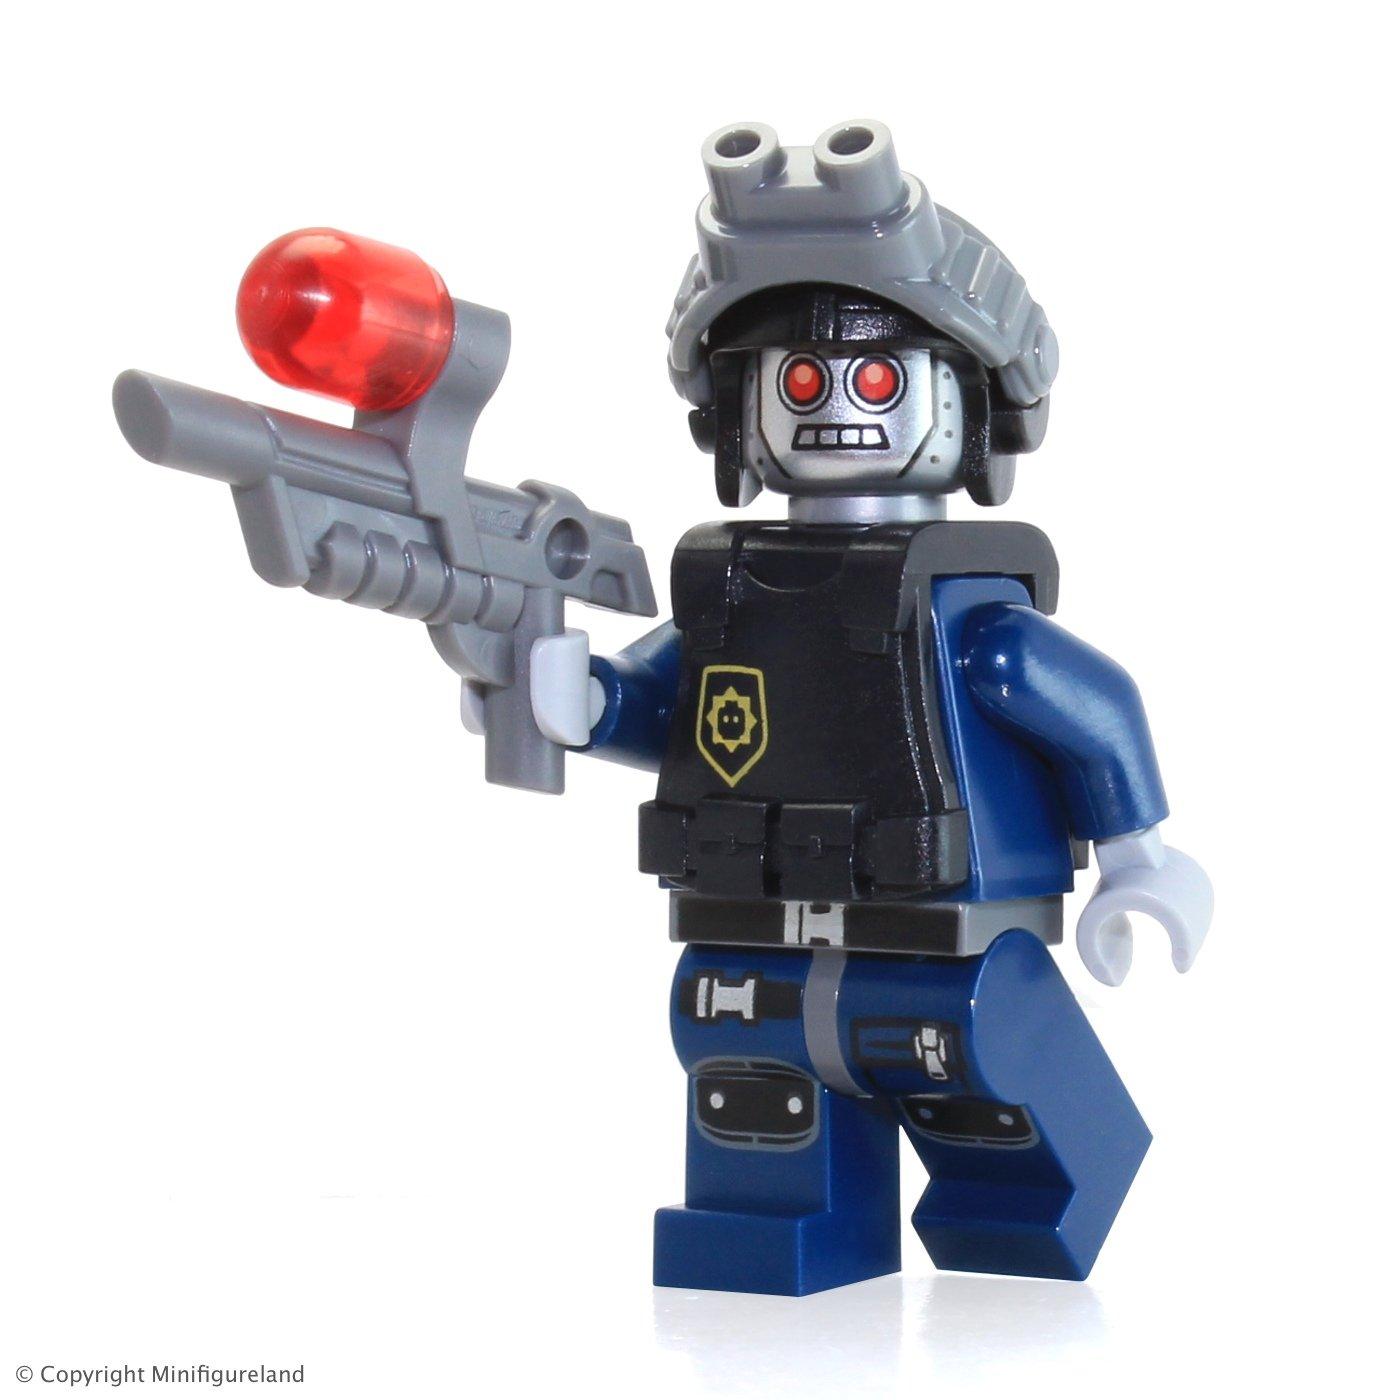 amazon com the lego movie minifigure robo swat w robot